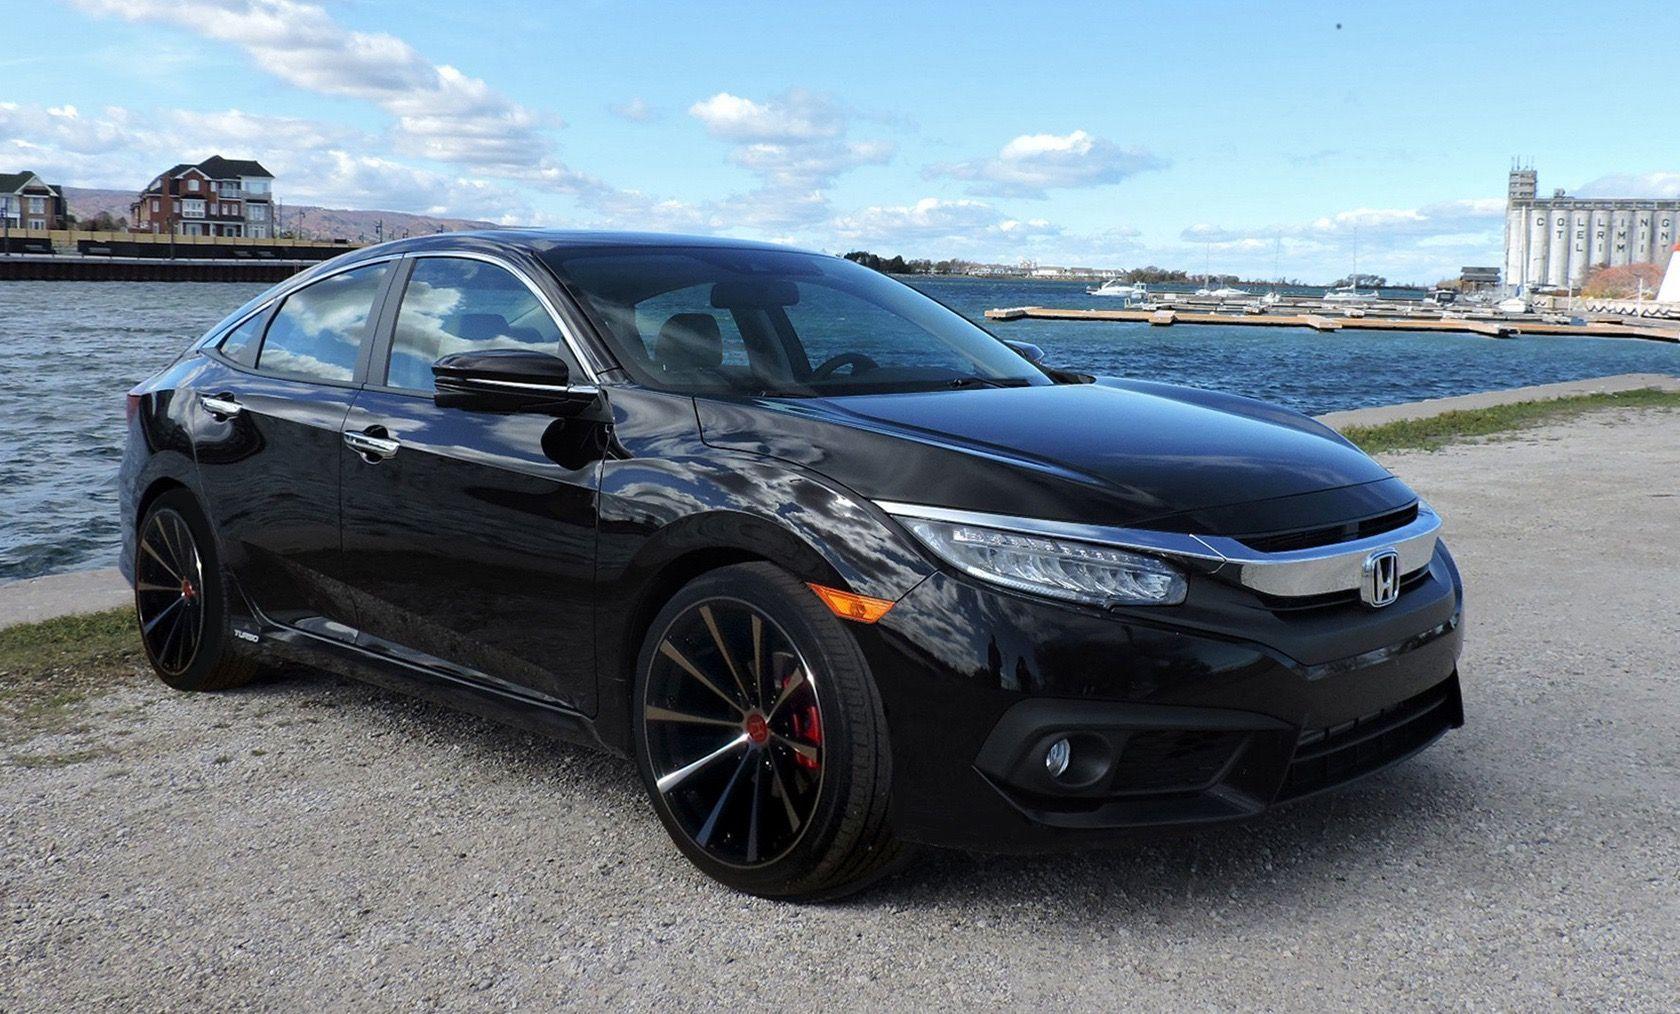 45+ Honda civic hatchback 2019 rims ideas in 2021